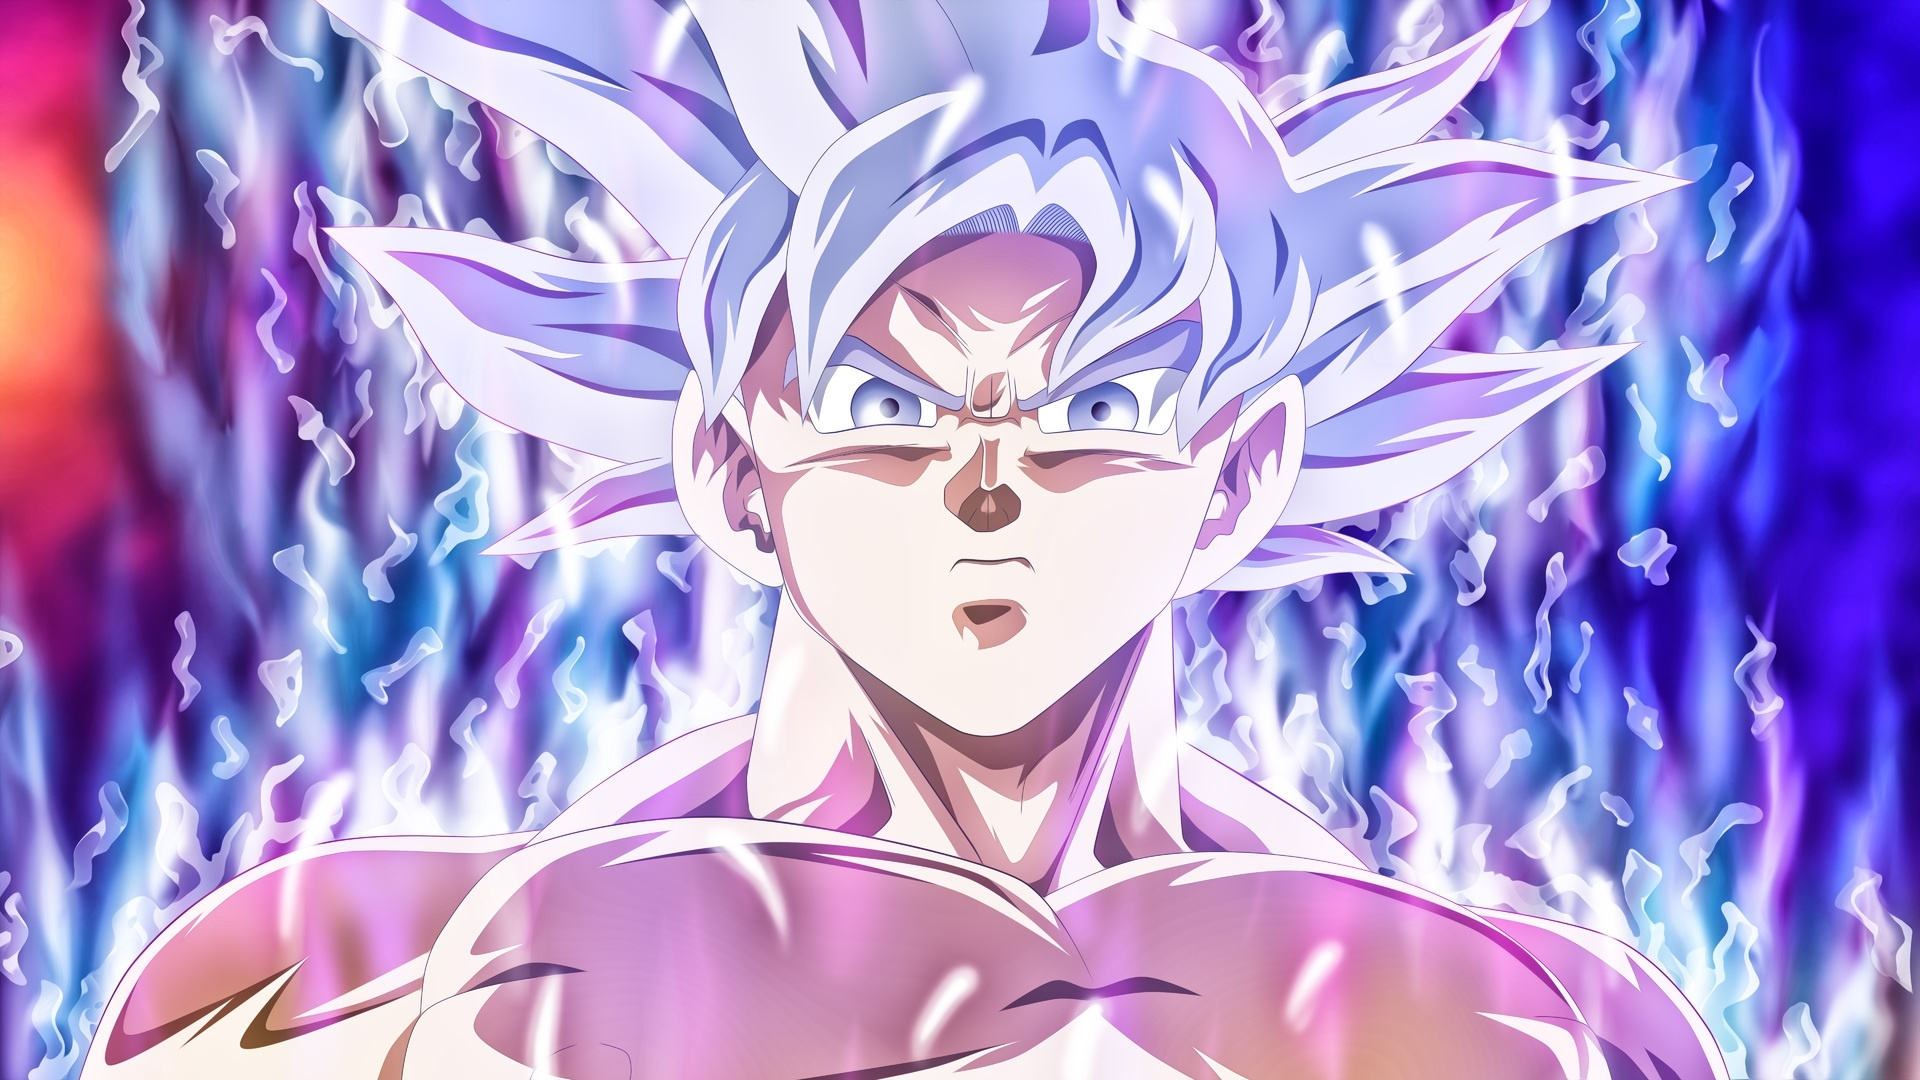 Goku Ultra Instinct hd background